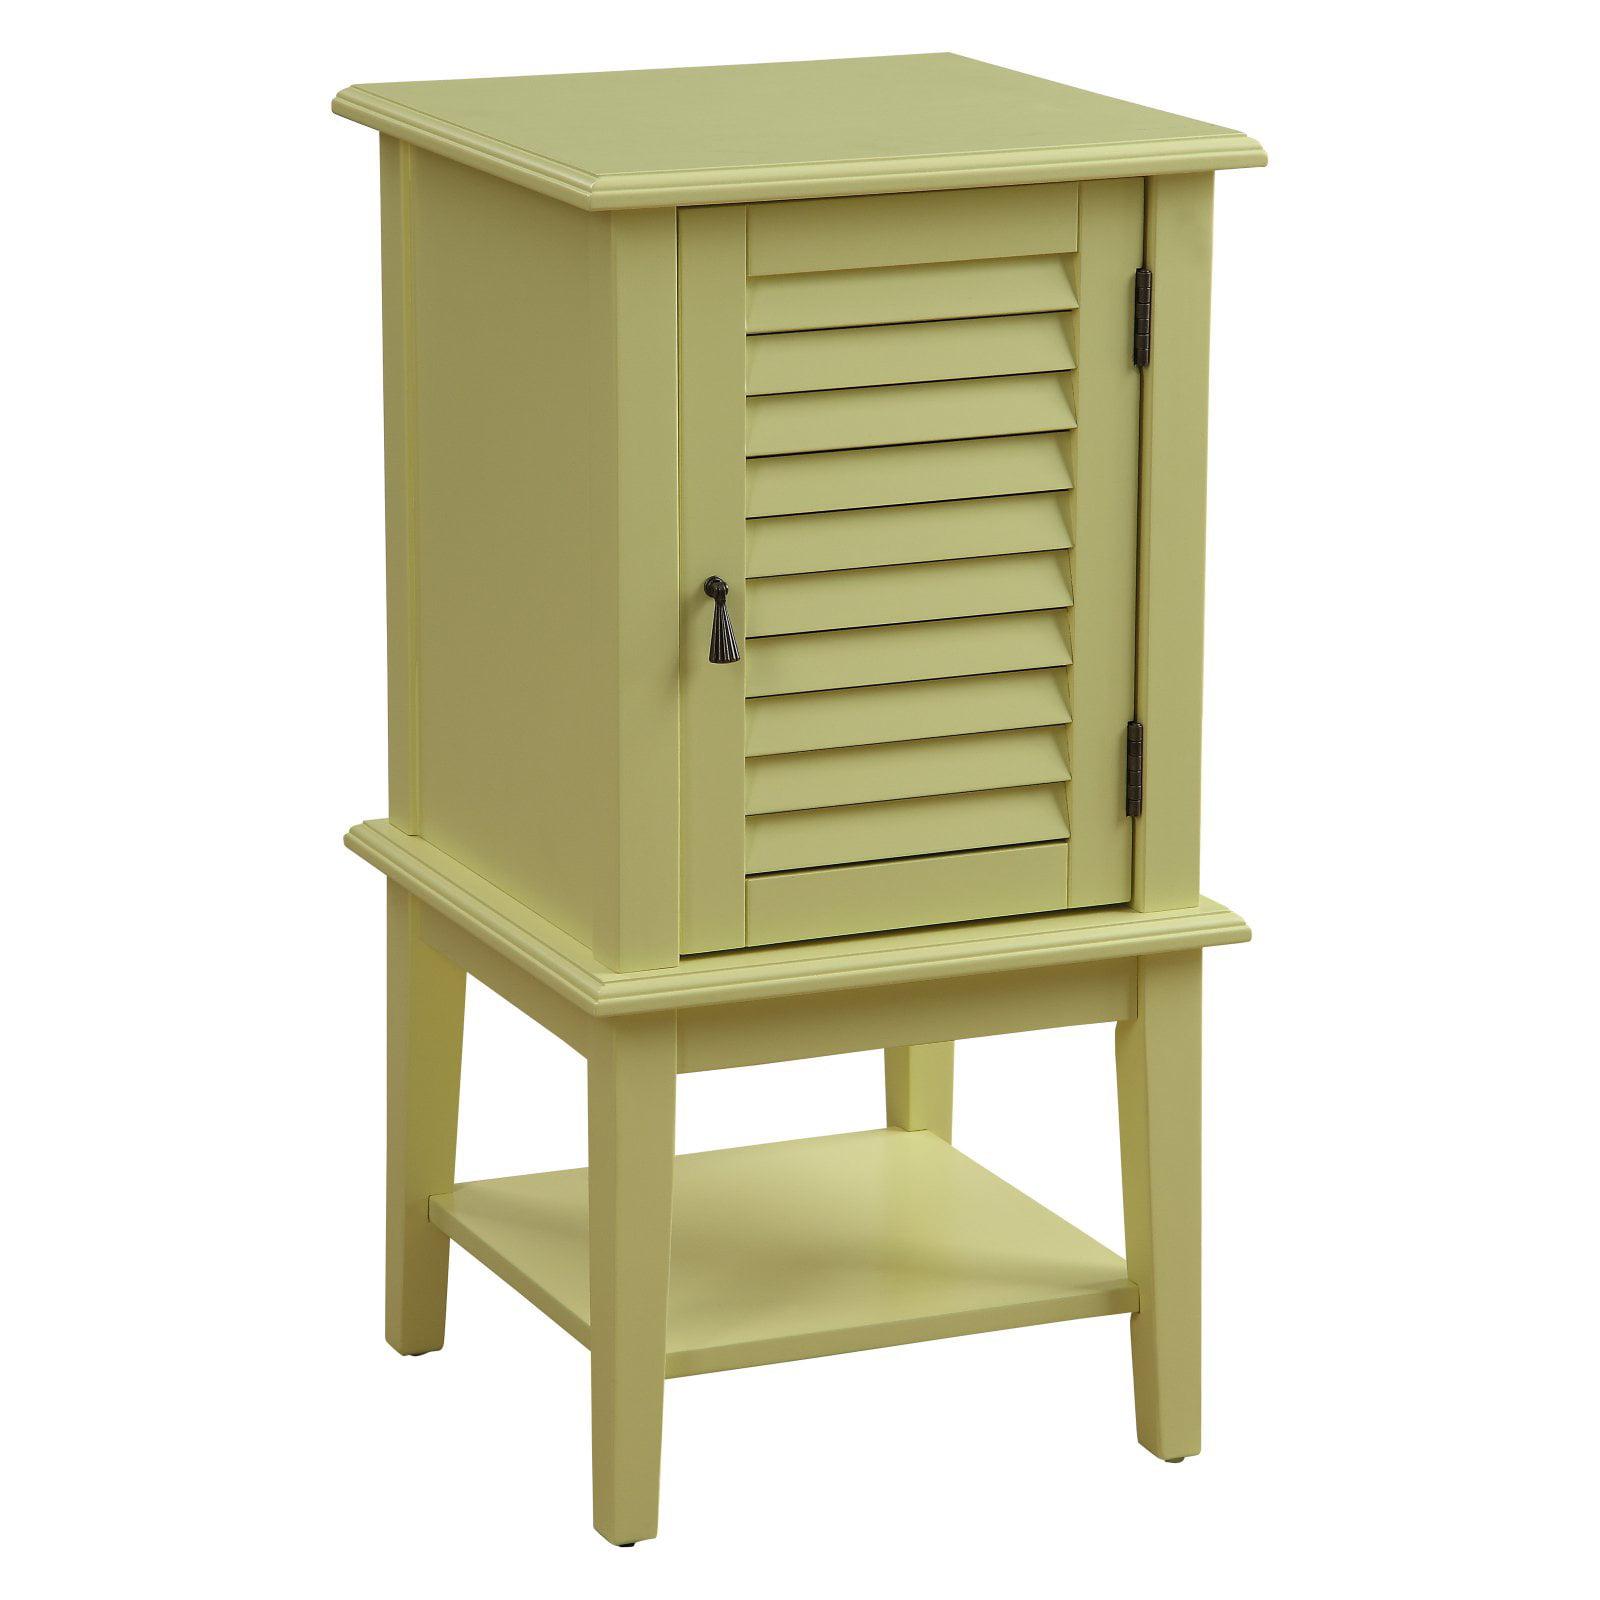 ACME Hilda II Floor Cabinet, Black